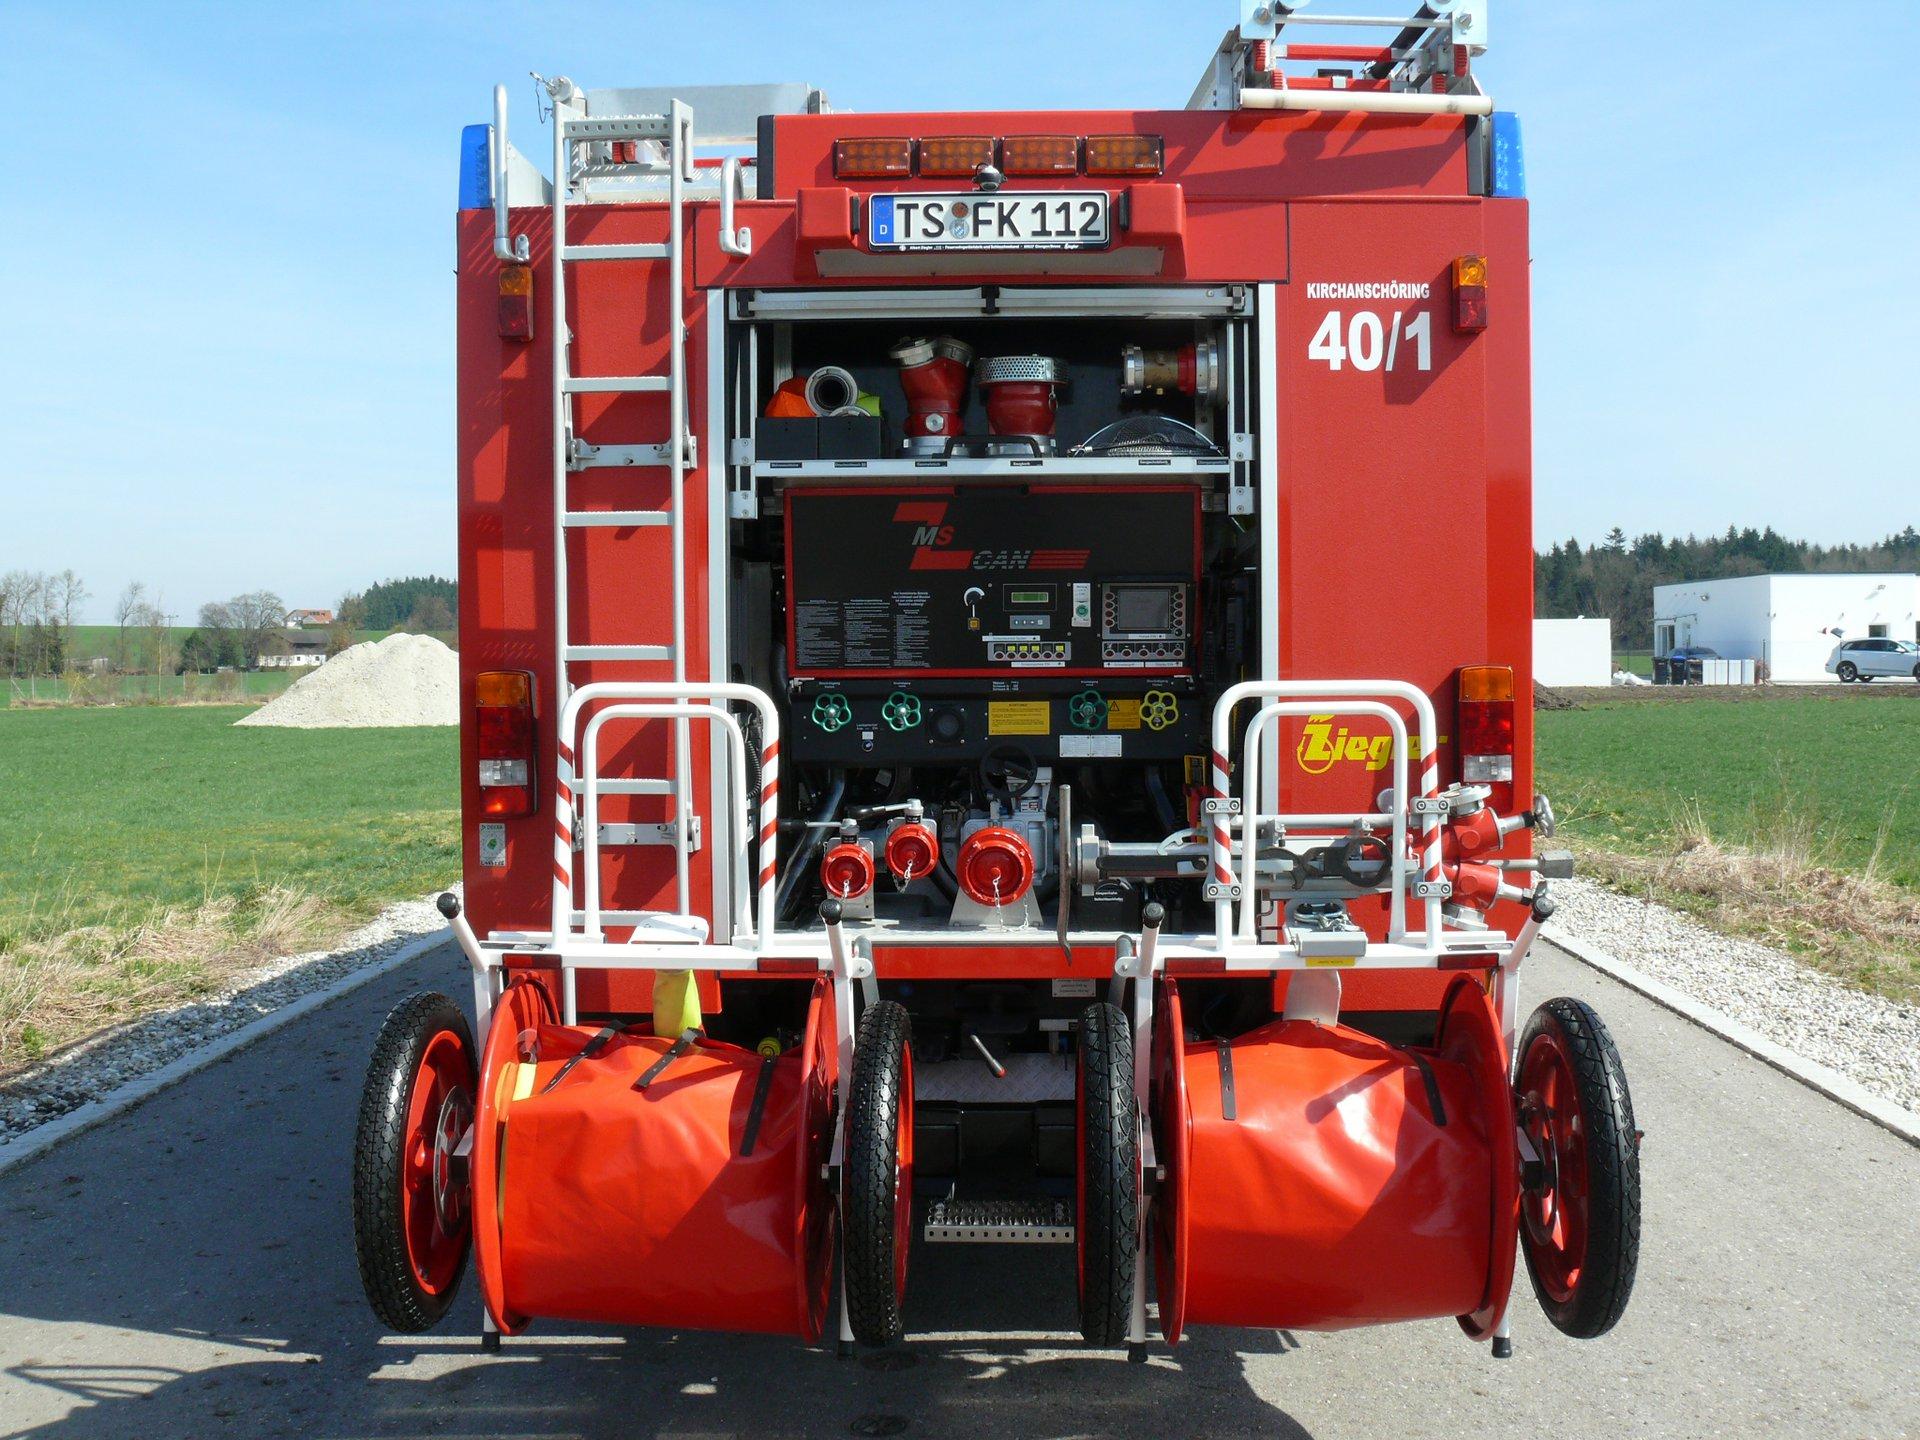 Freiwillige Feuerwehr Kirchanschoring E V Fahrzeuge